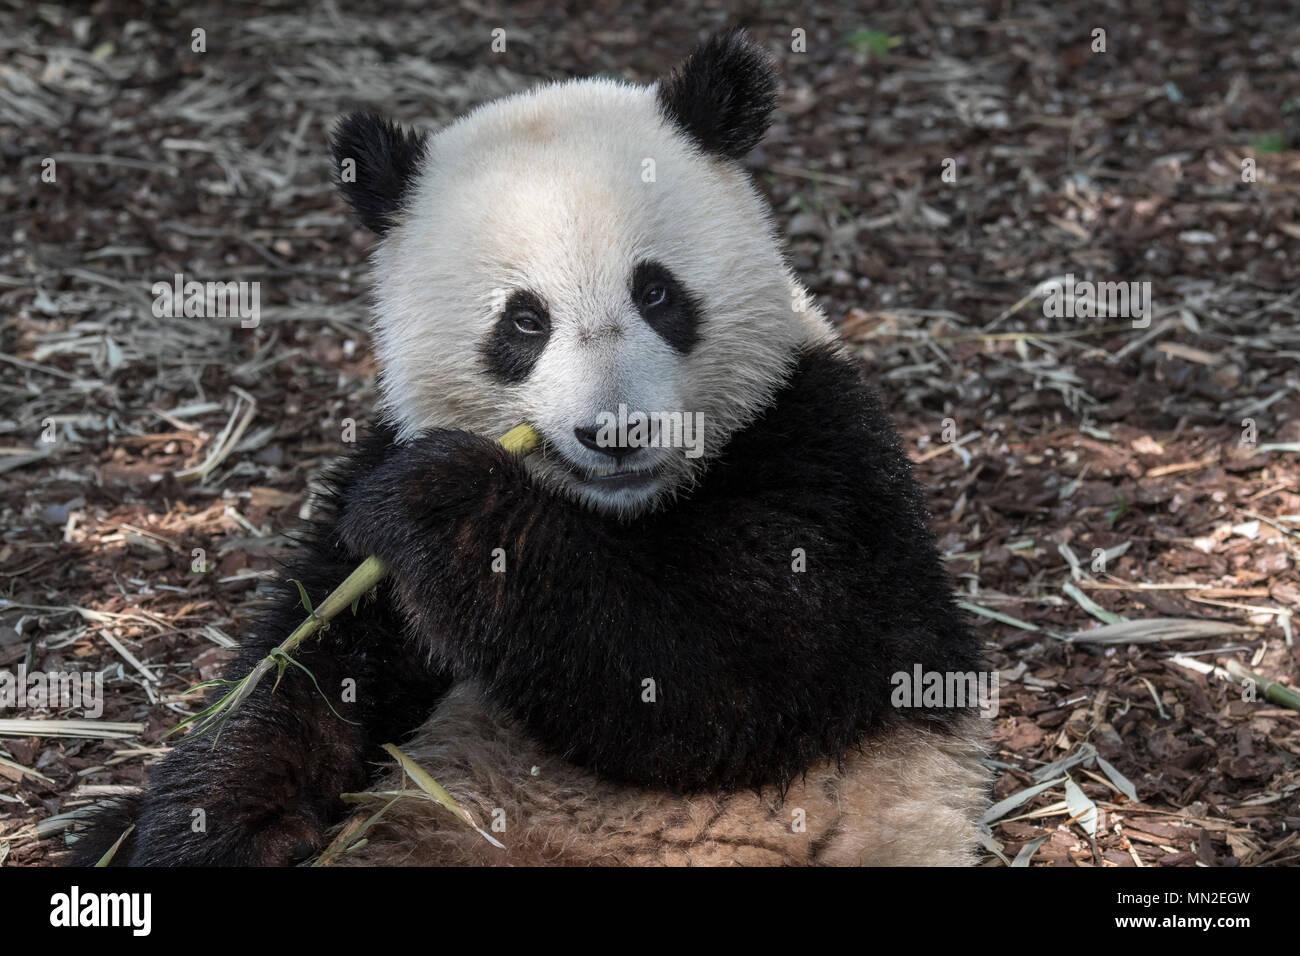 Young two year old giant panda (Ailuropoda melanoleuca) cub eating bamboo - Stock Image